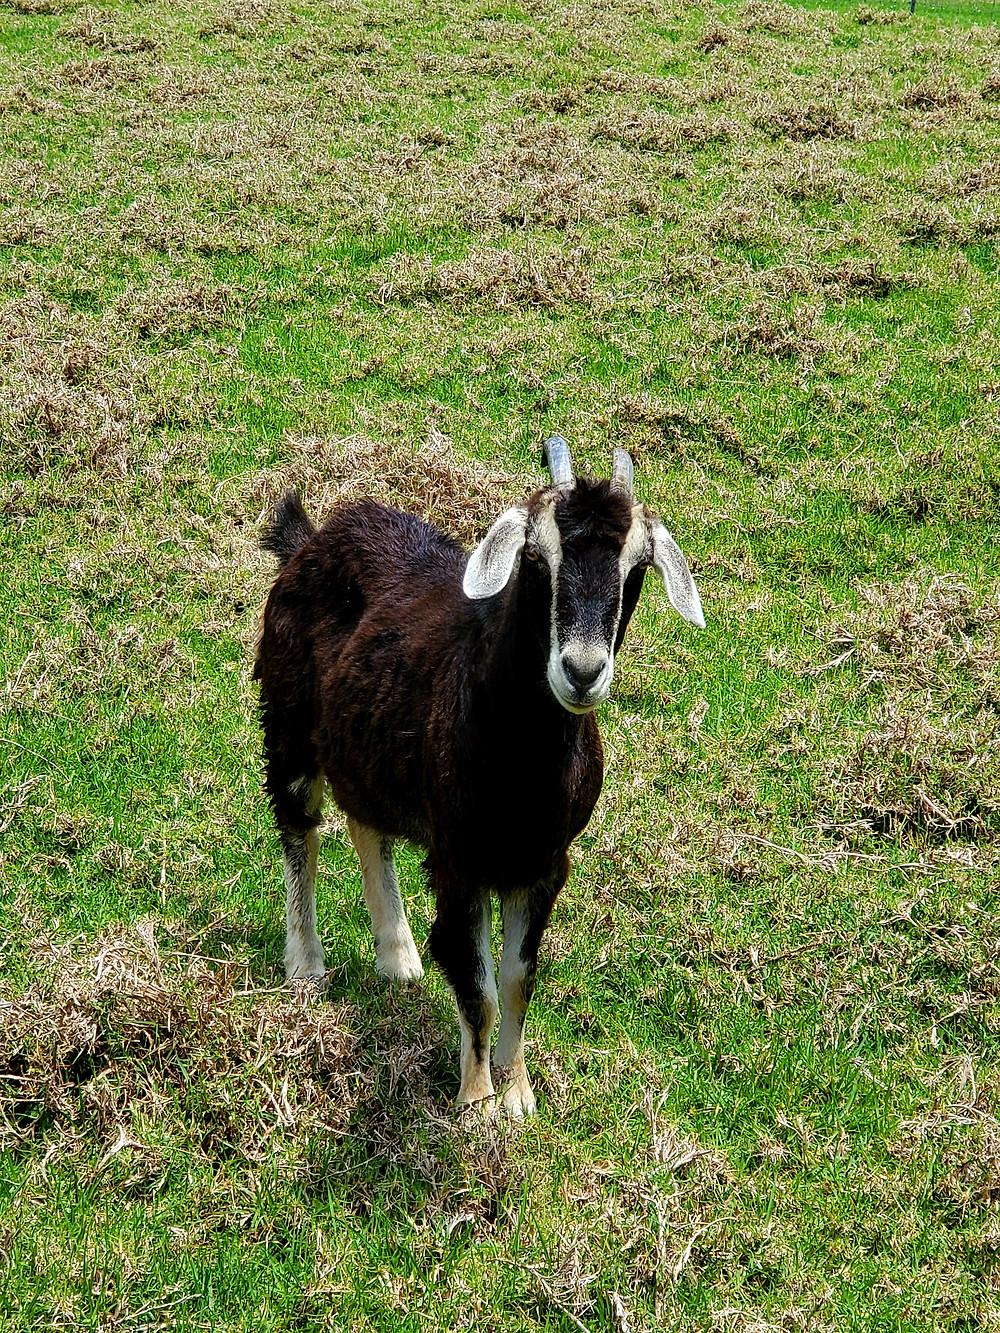 Koza Gracie - towarzyszy mi podczas kwarantanny. Fot. Mariola Johnson